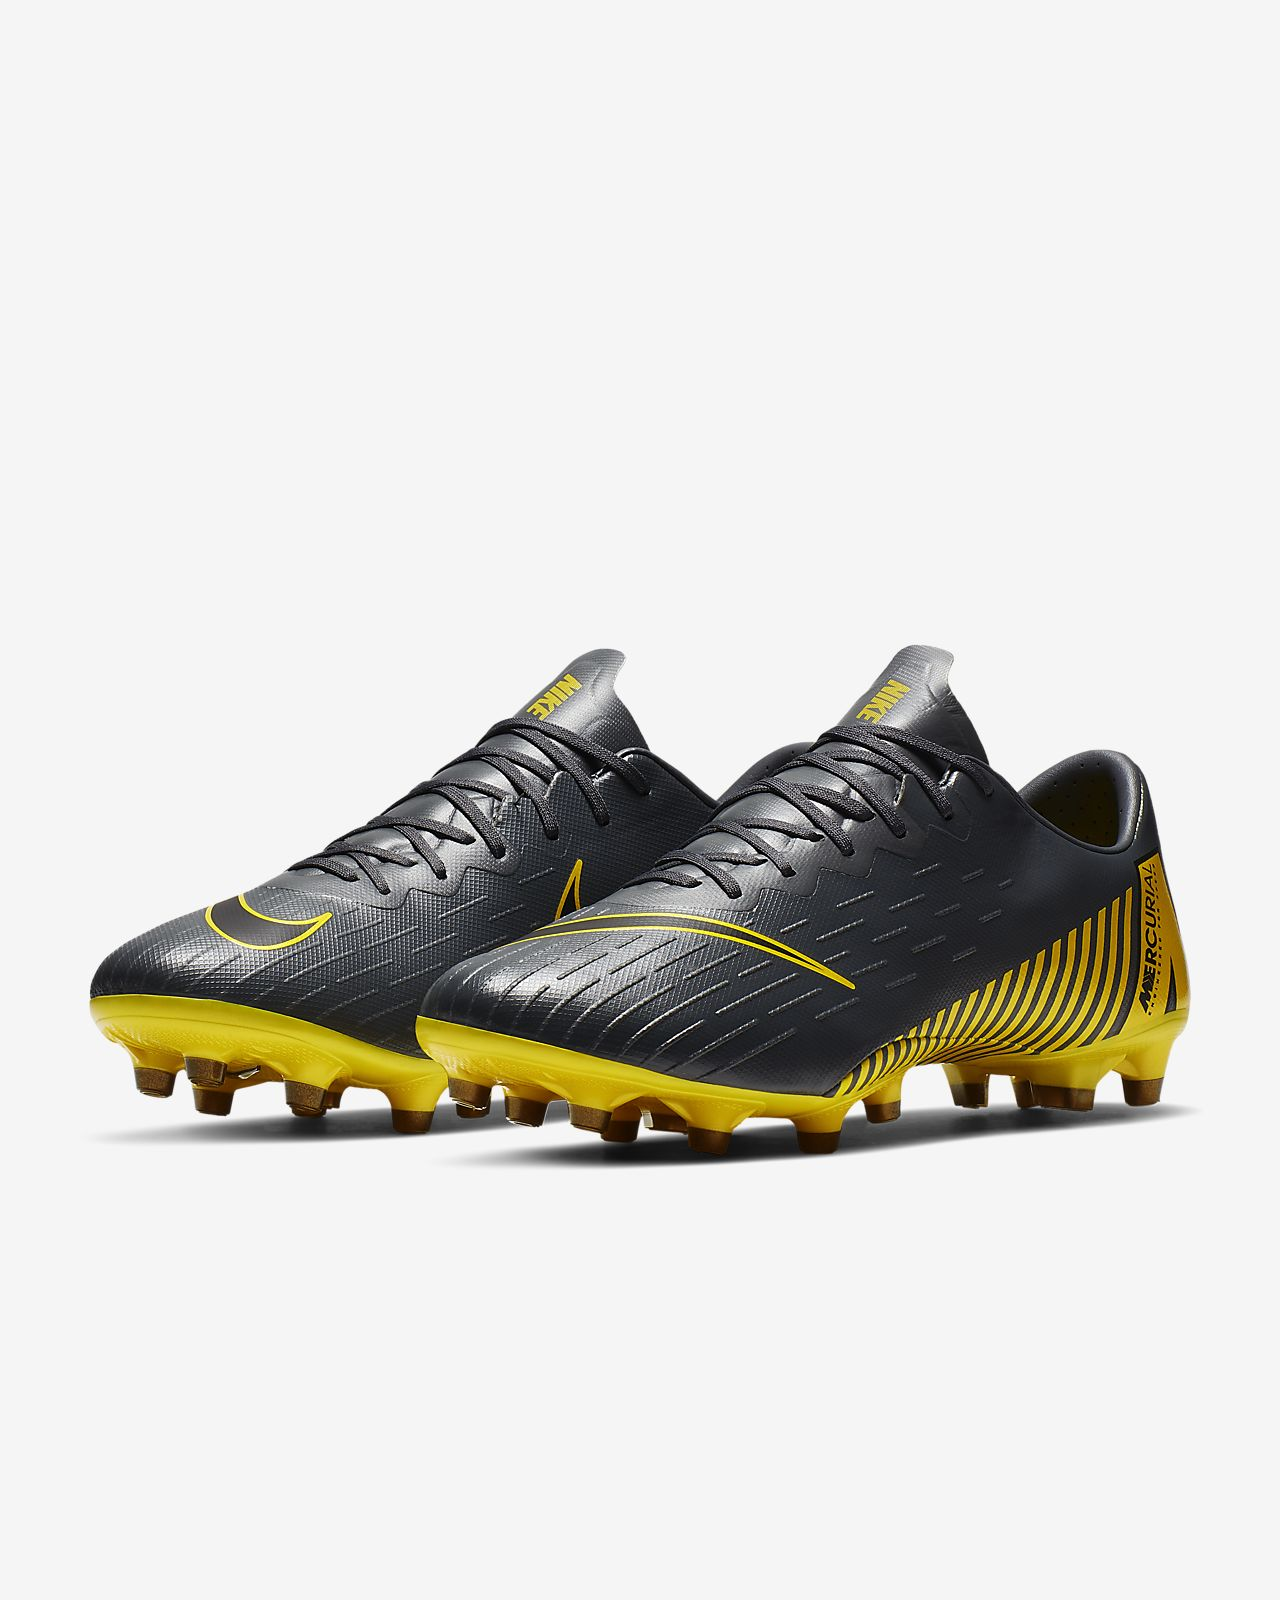 a1050eee0493 ... Nike Mercurial Vapor XII Pro AG-PRO Artificial-Grass Football Boot